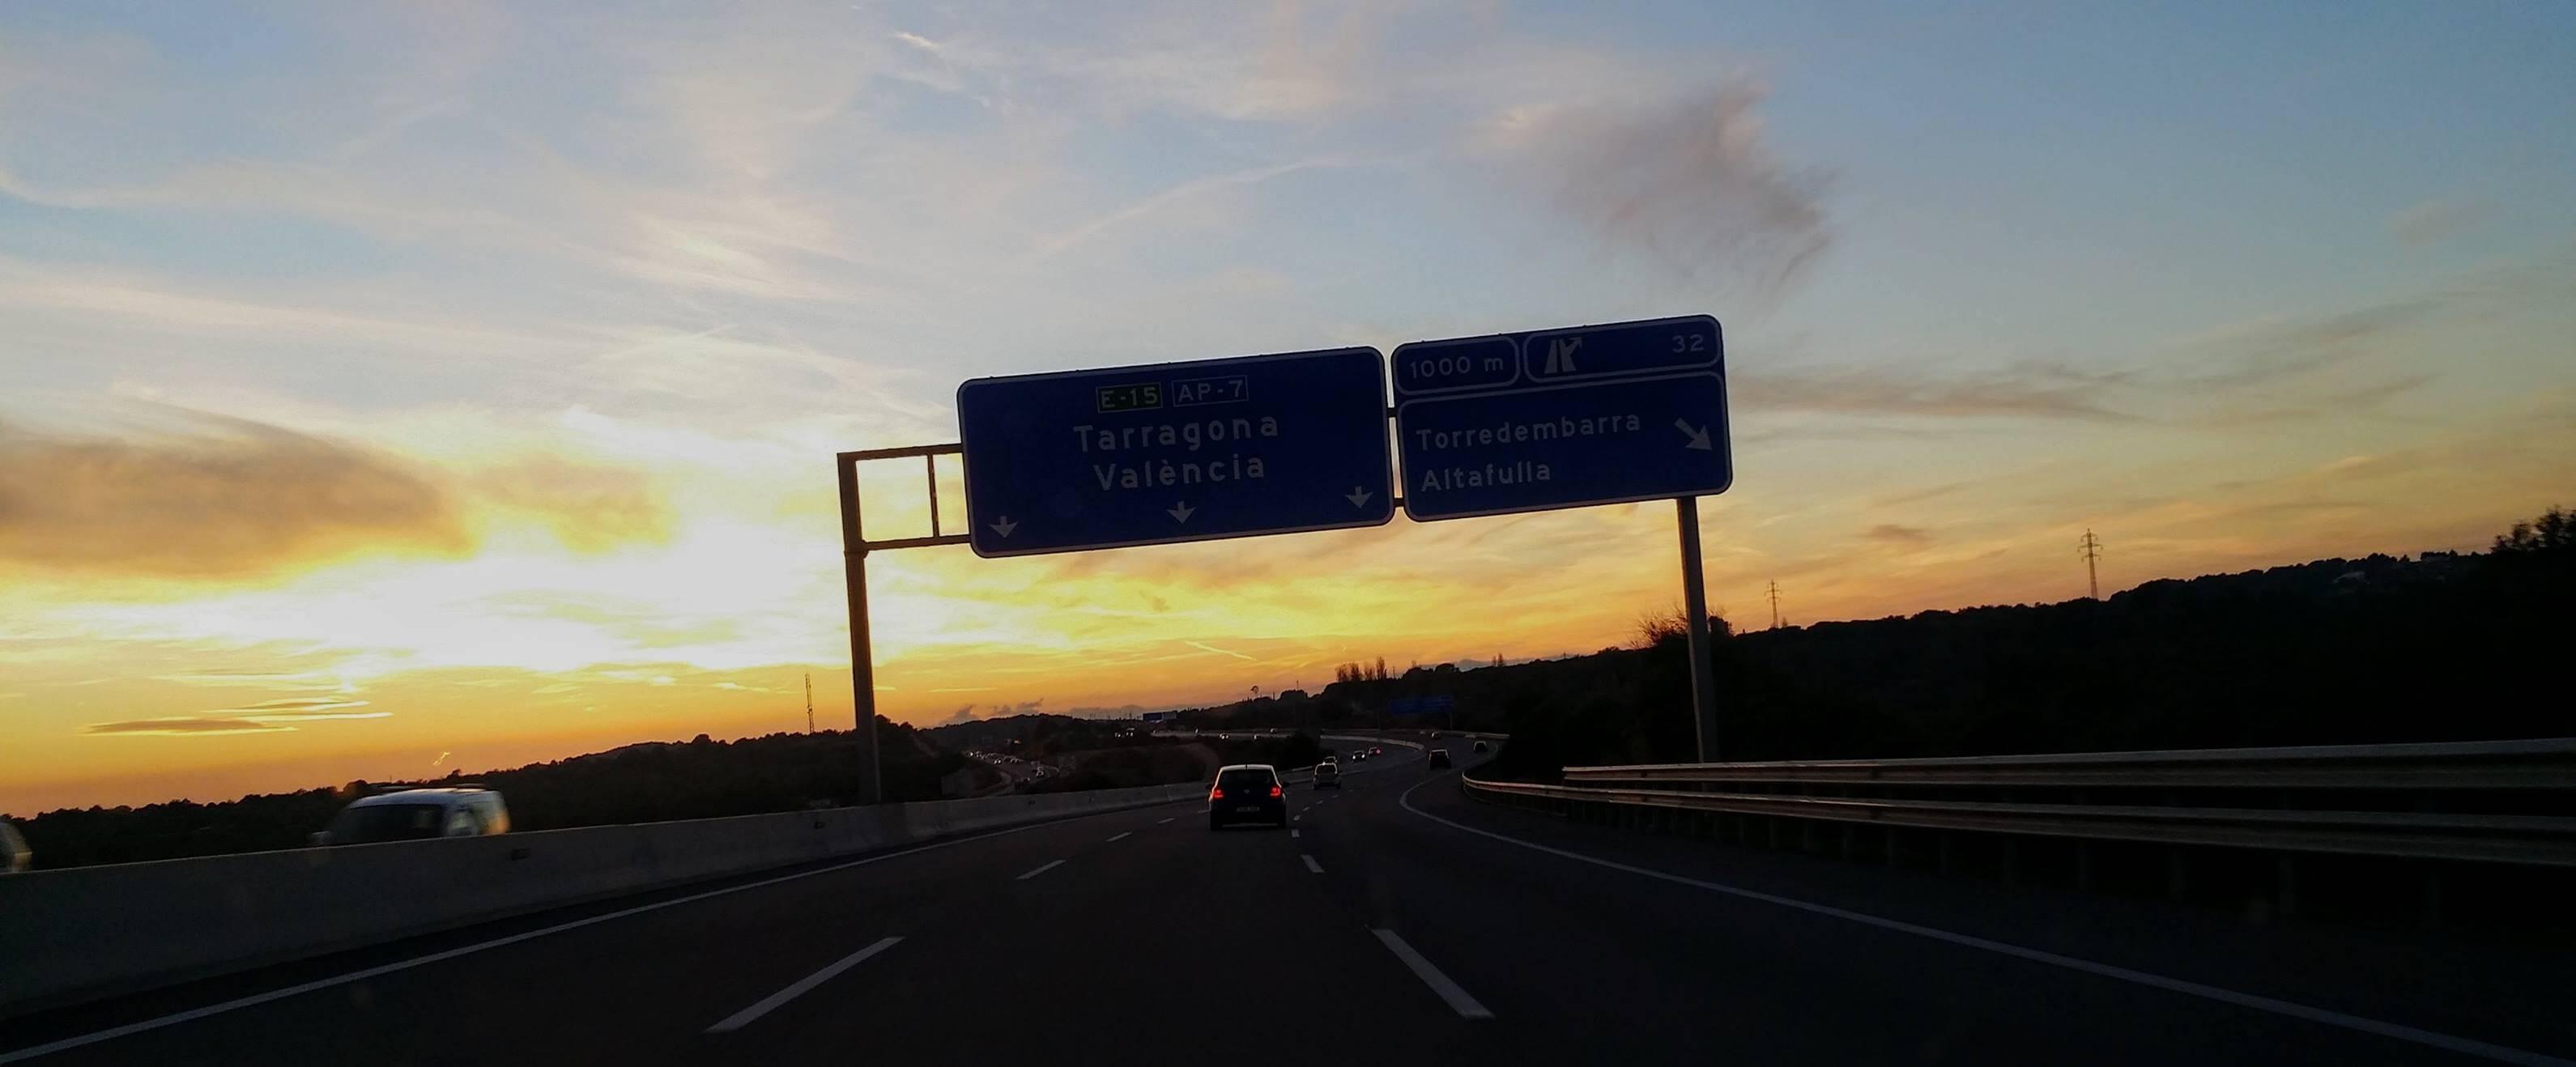 Autobahn AP7 nach Spanien